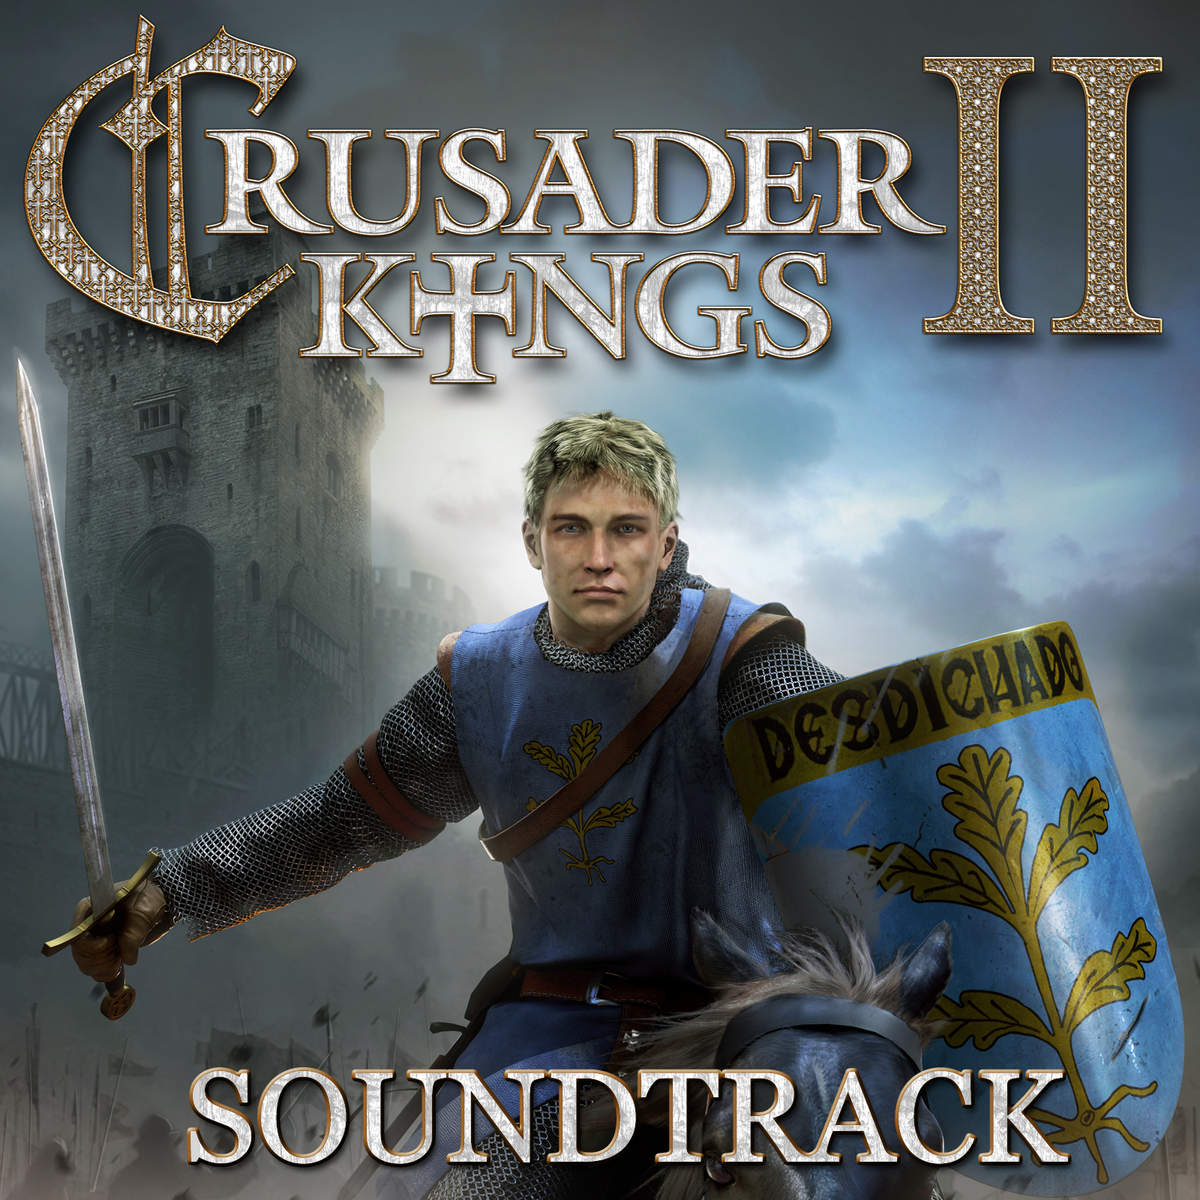 Crusader_Kings_2_Soundtrack__cover1200x1200.jpg